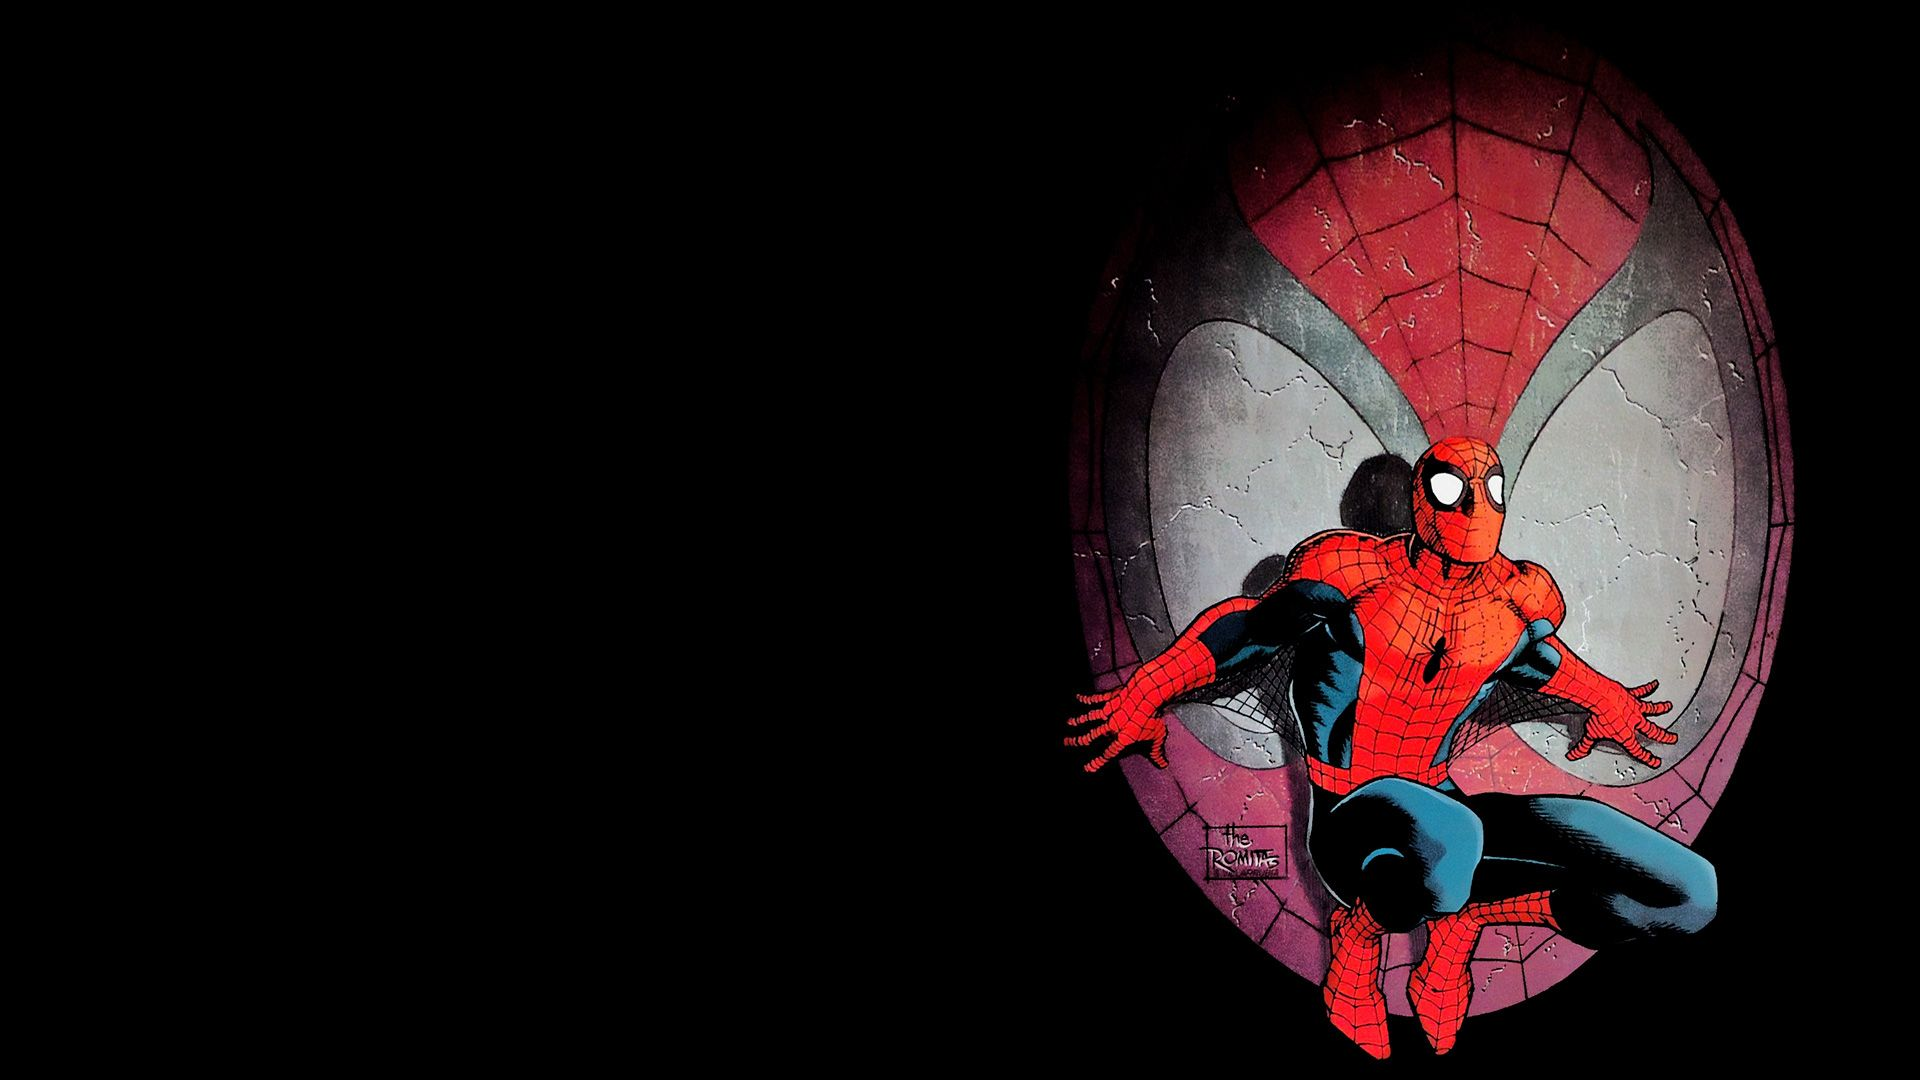 Spiderman Wallpaper Desktop Ng0 1920x1080 Px 33506 KB Movie 3 Black Deadpool Iphone Logo